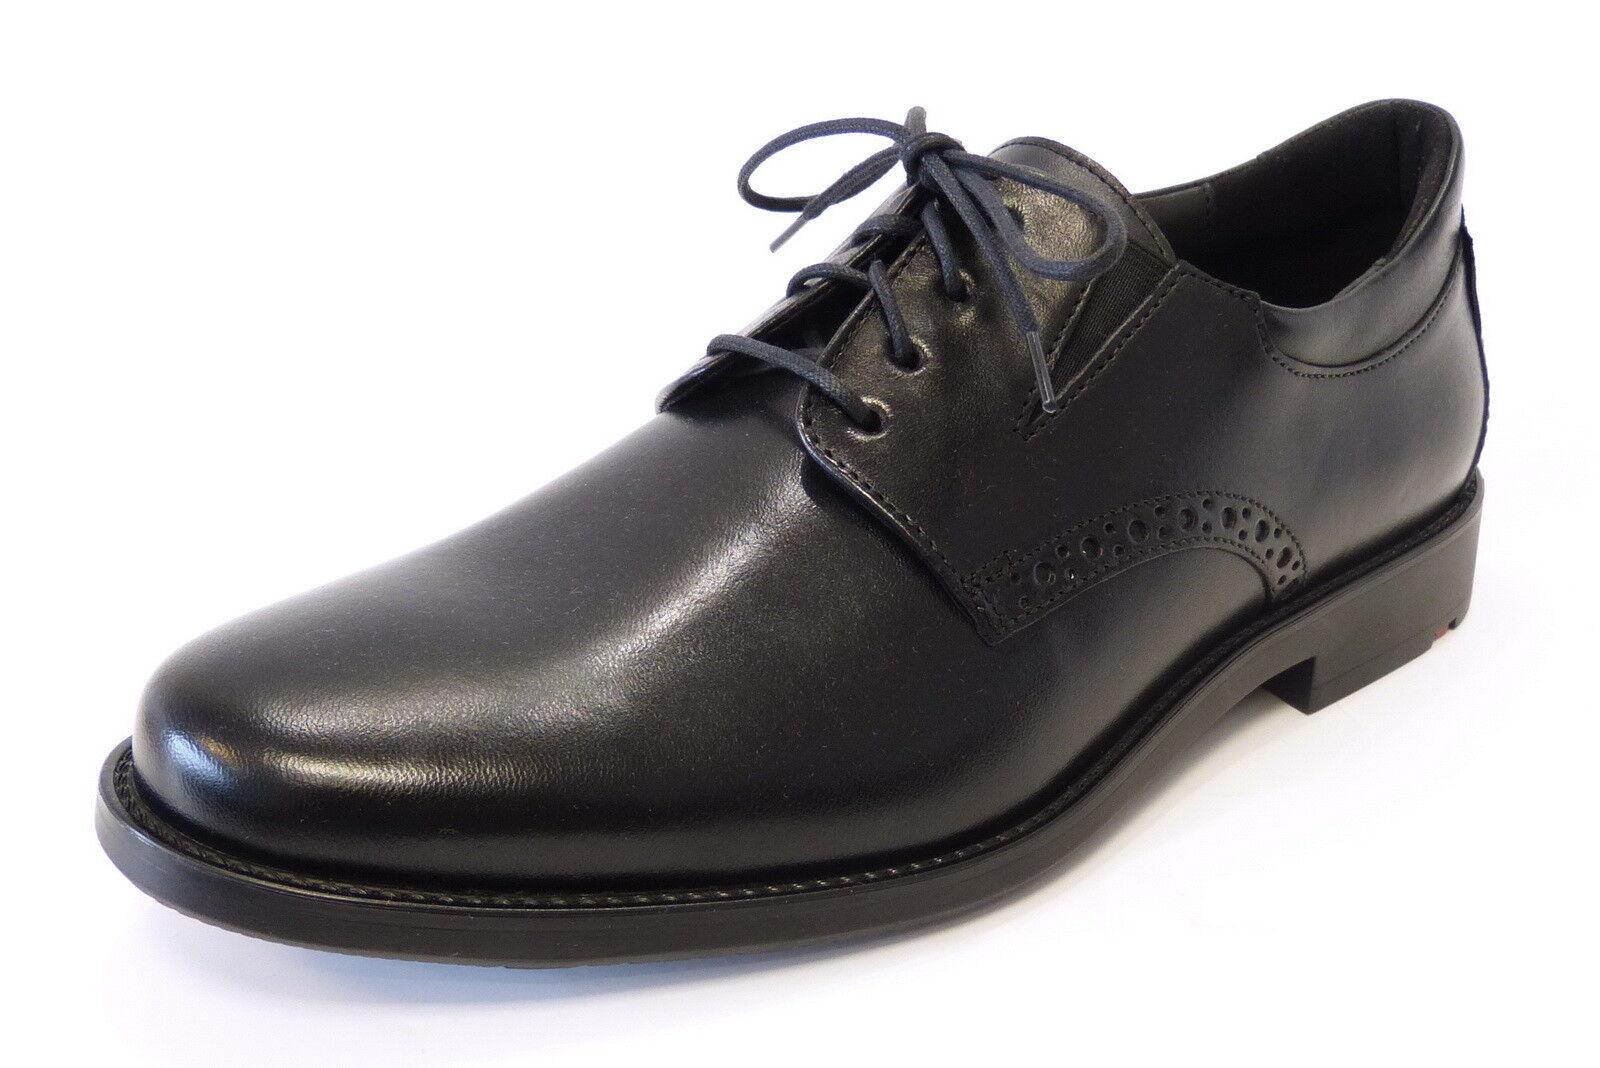 Lloyd Business Schnür Schuh Kolor 26-869-00 schwarz Extraweit Leder Gummisohle